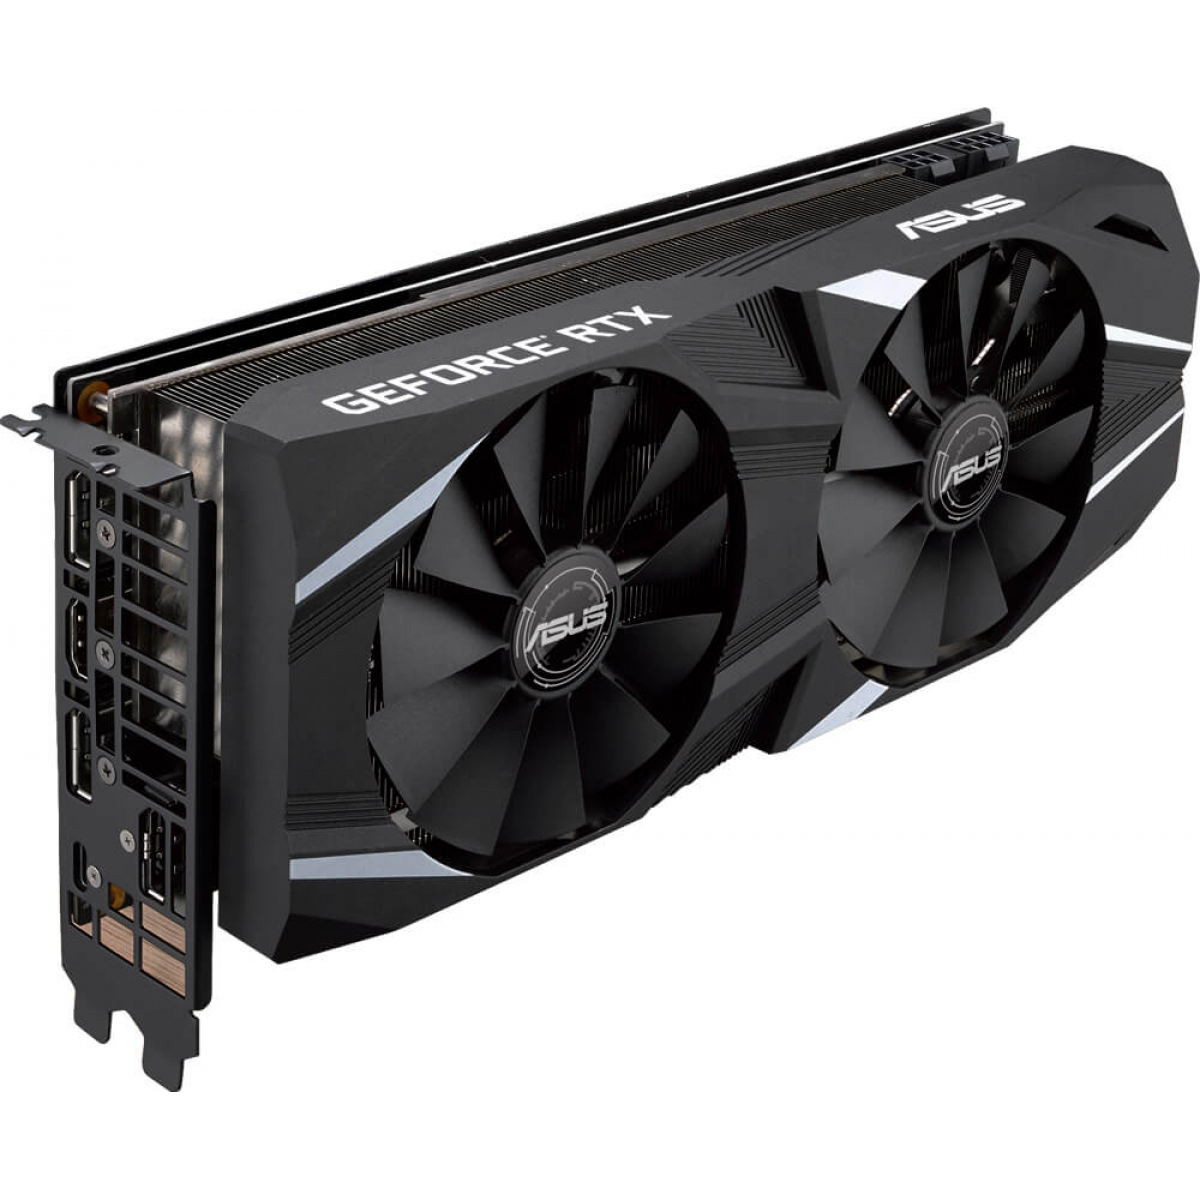 Placa de Vídeo Asus, Geforce, RTX 2070 Advanced, Dual, 8GB, GDDR6, 256Bit, DUAL-RTX2070-A8G